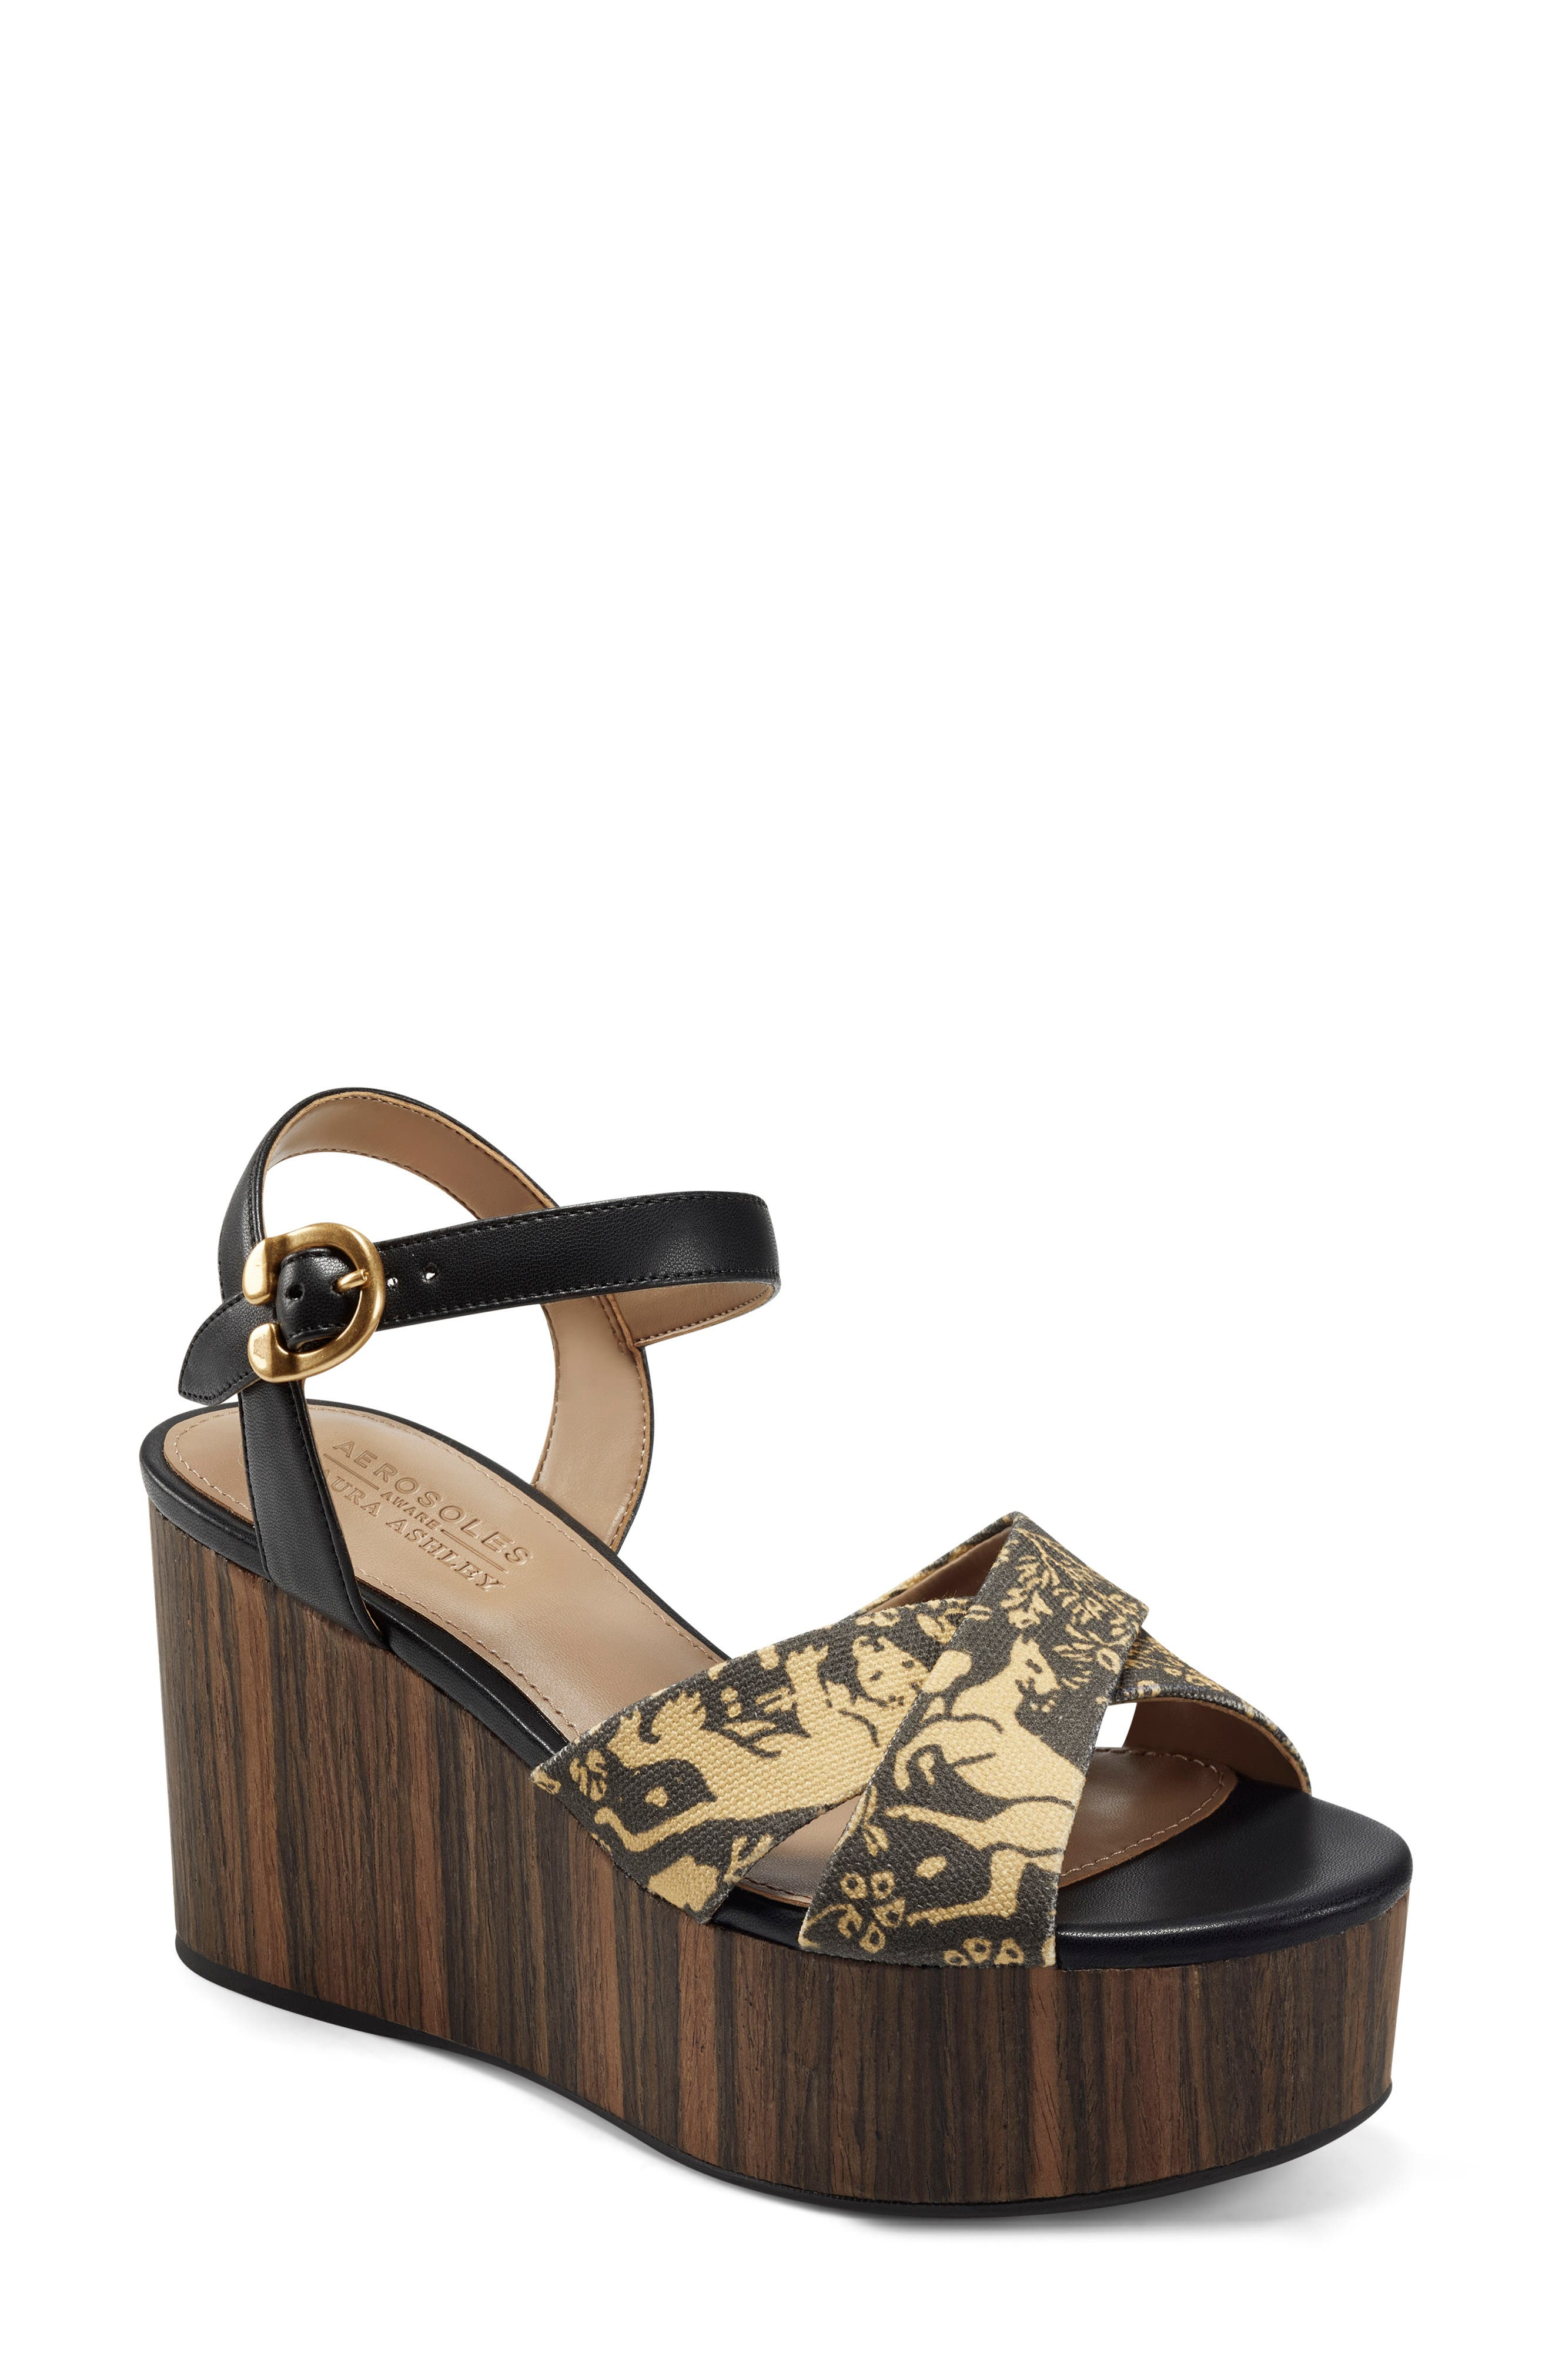 X Laura Ashley Haylee Platform Wedge Sandal